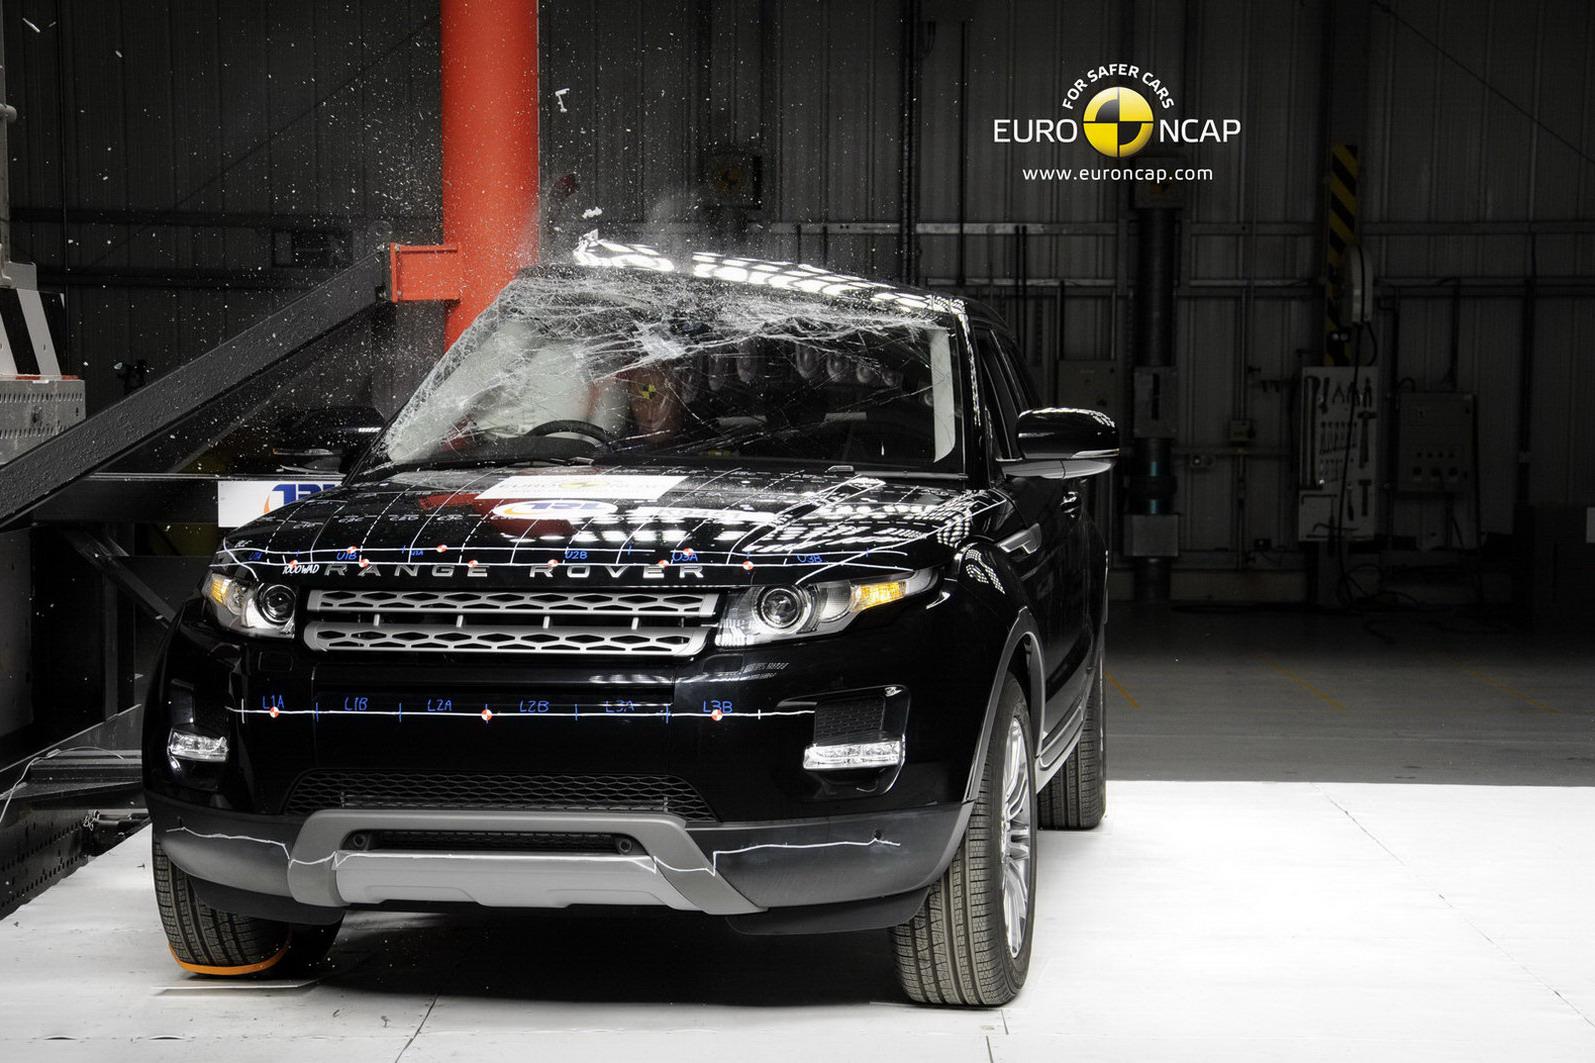 range rover evoque gets five star euro ncap rating autoevolution. Black Bedroom Furniture Sets. Home Design Ideas